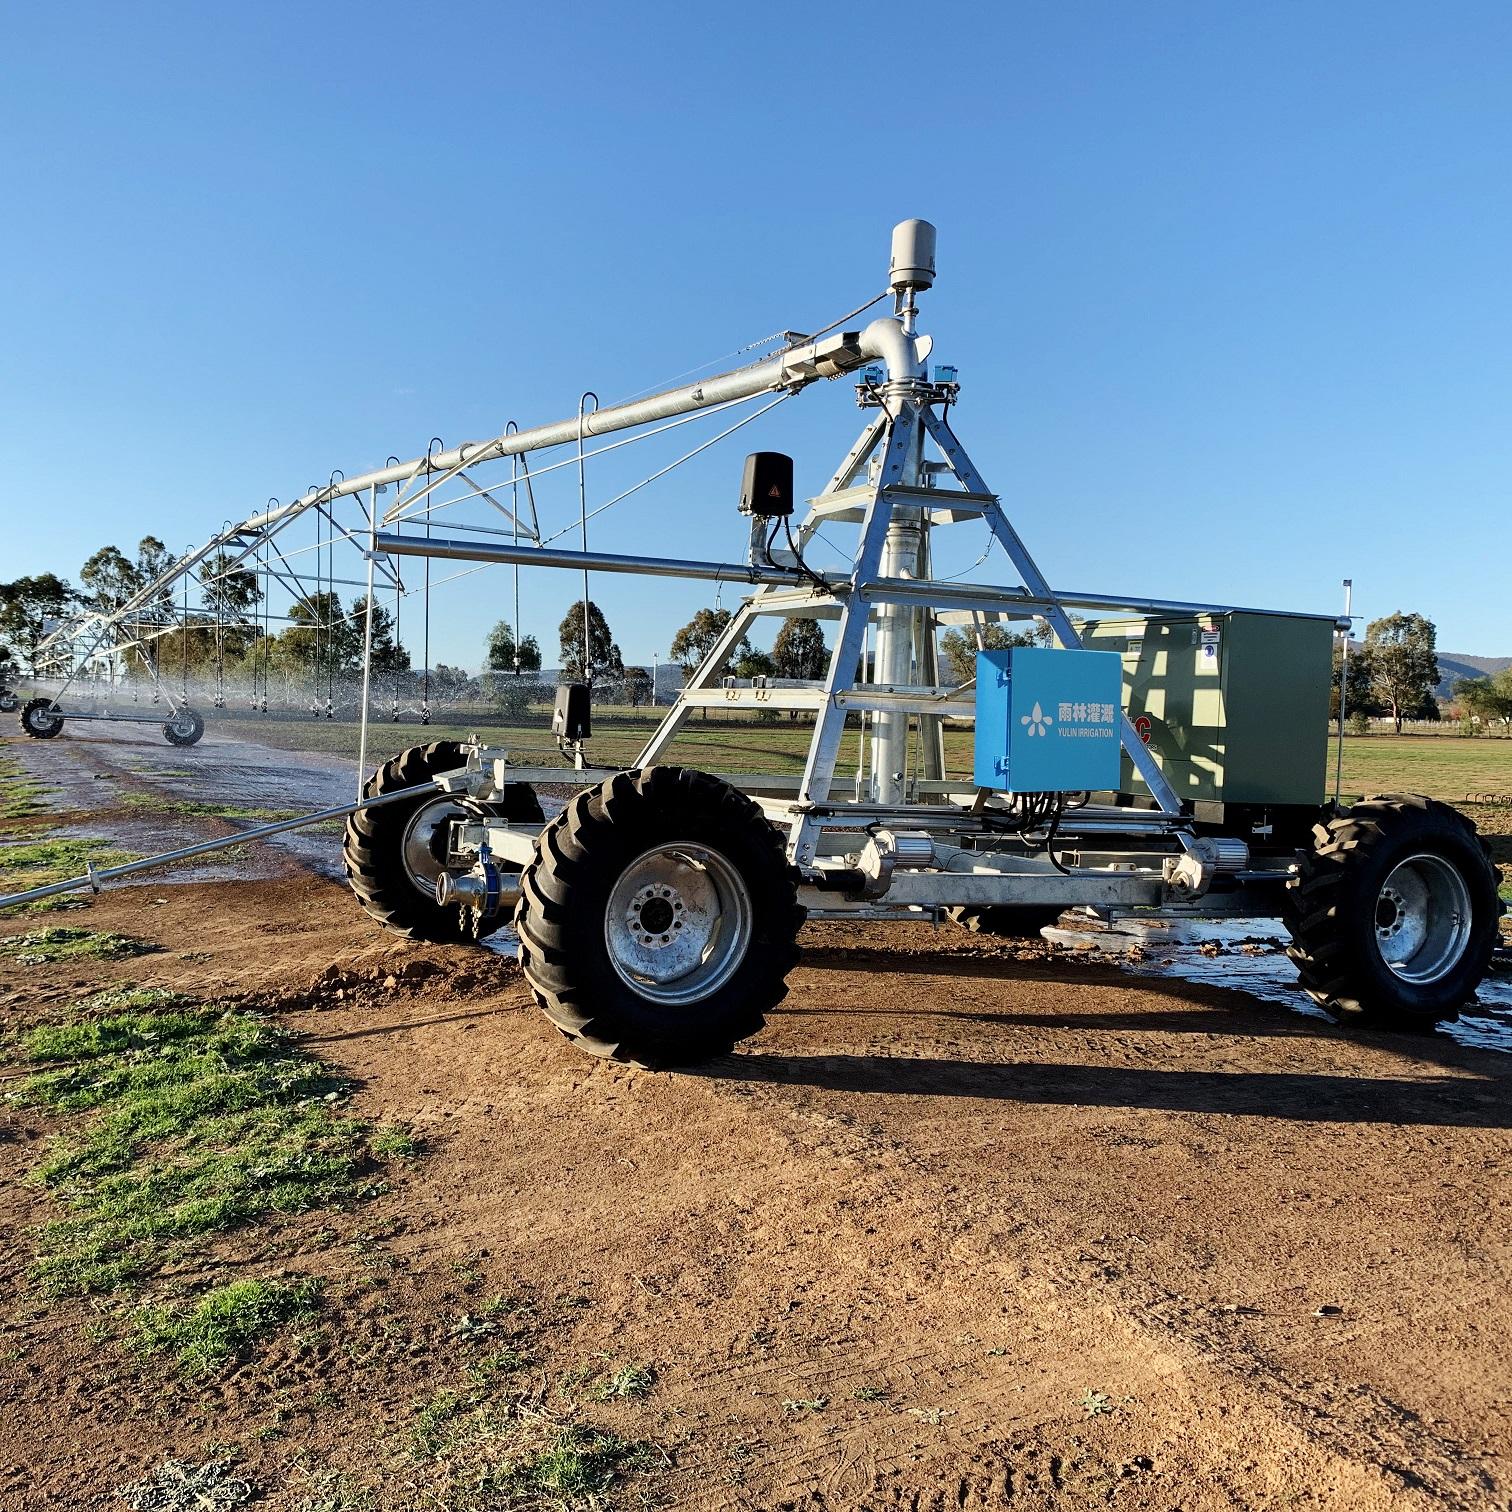 Linear Move Irrigation Machine with Pivot Manufacturers, Linear Move Irrigation Machine with Pivot Factory, Supply Linear Move Irrigation Machine with Pivot